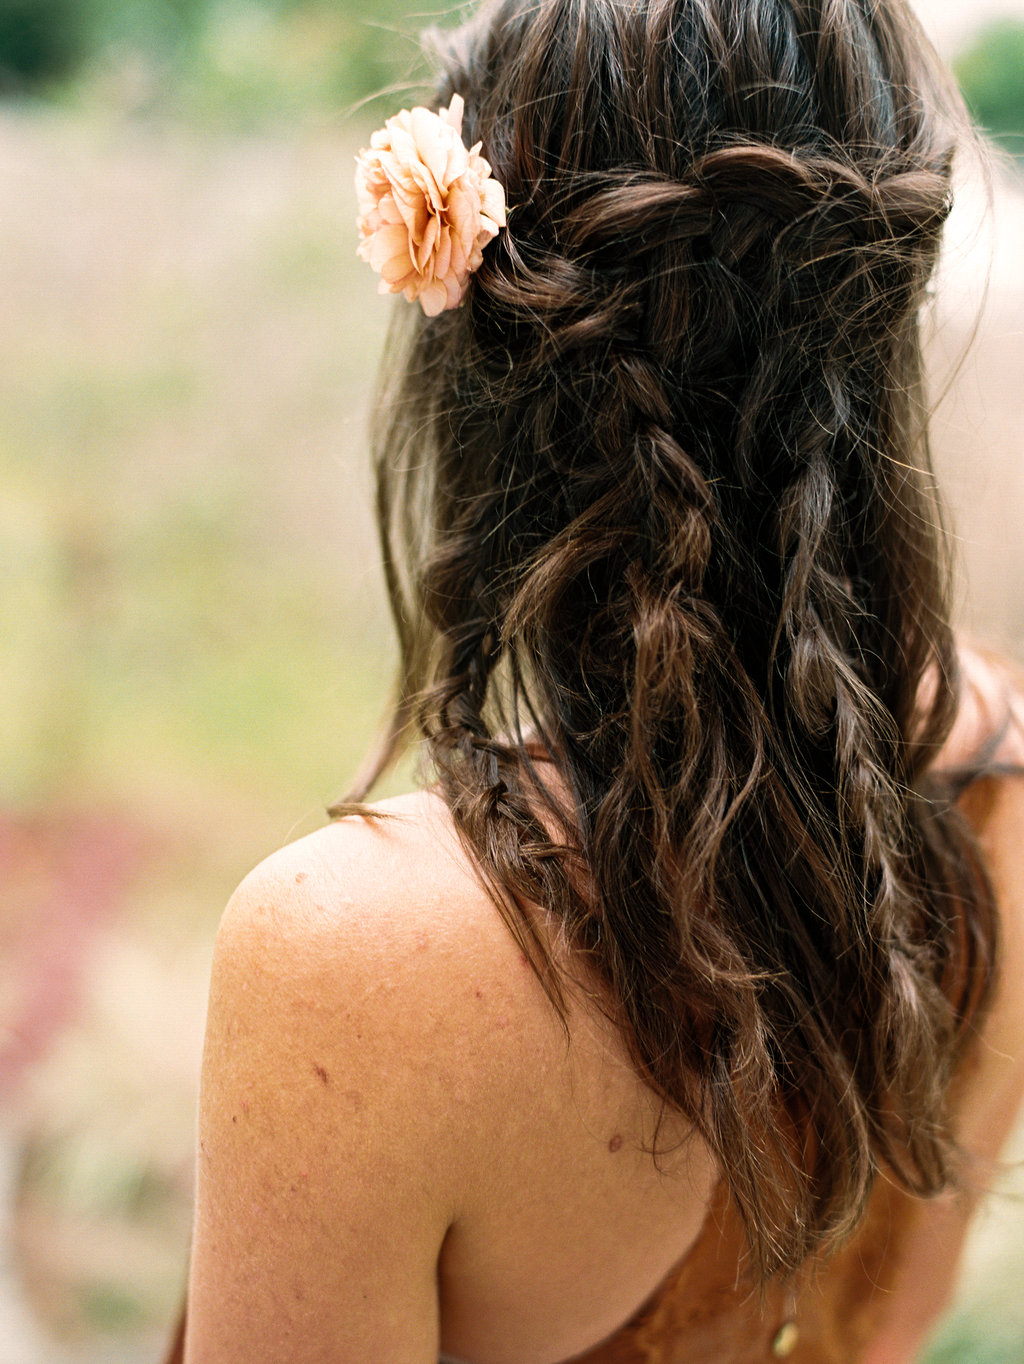 jacksonville-wedding-photographer-forest-elopement-83.jpg